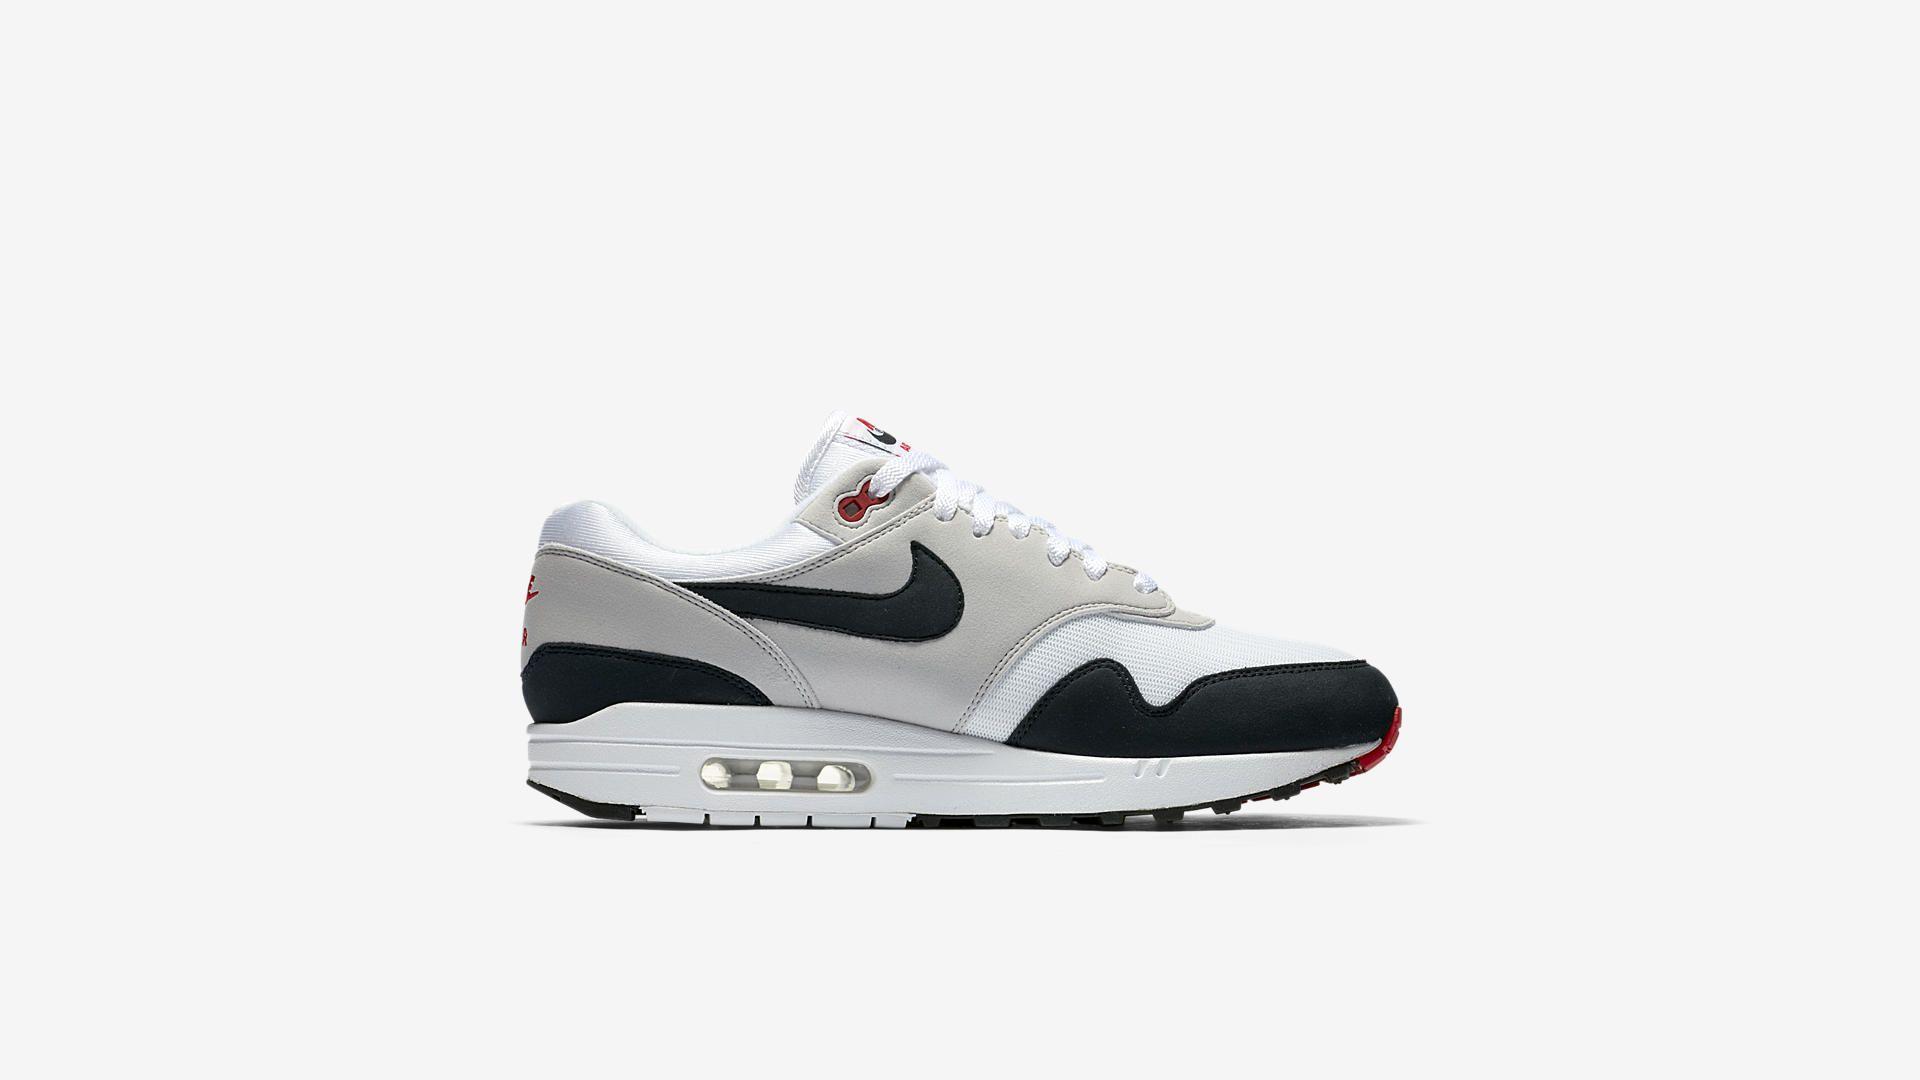 23bfa08ce8f1 ... italy nike air max 1 anniversary obsidian snkr sneaker sneakers  sneakerhead solecollector sneakerfreaker nicekicks kicks kotd